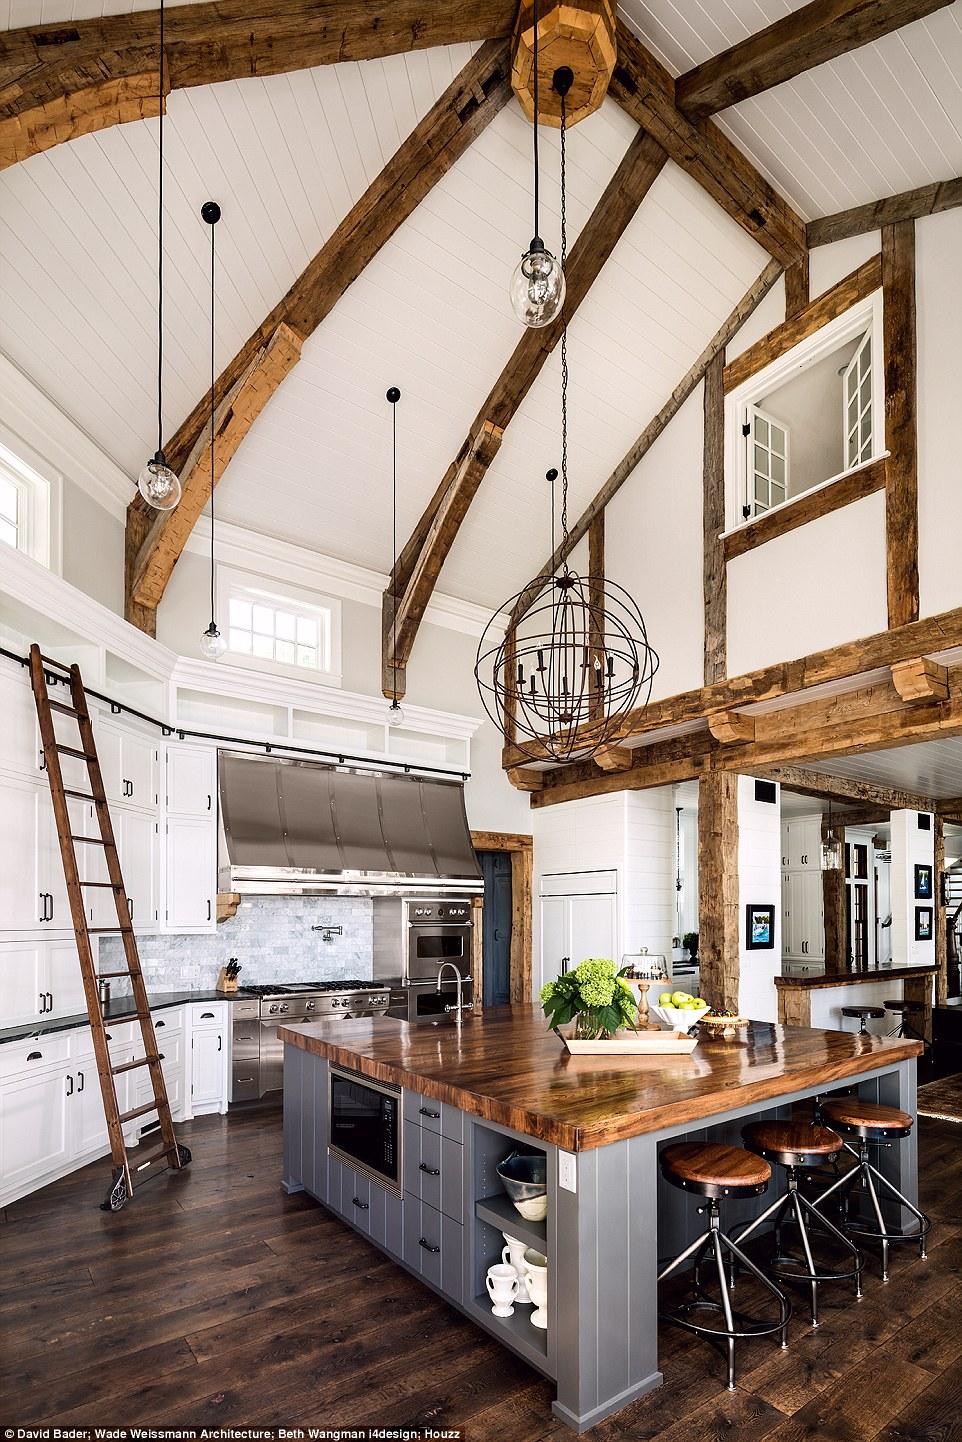 Hawaii Slanted House Design: Desse Design Tasarım Uygulama